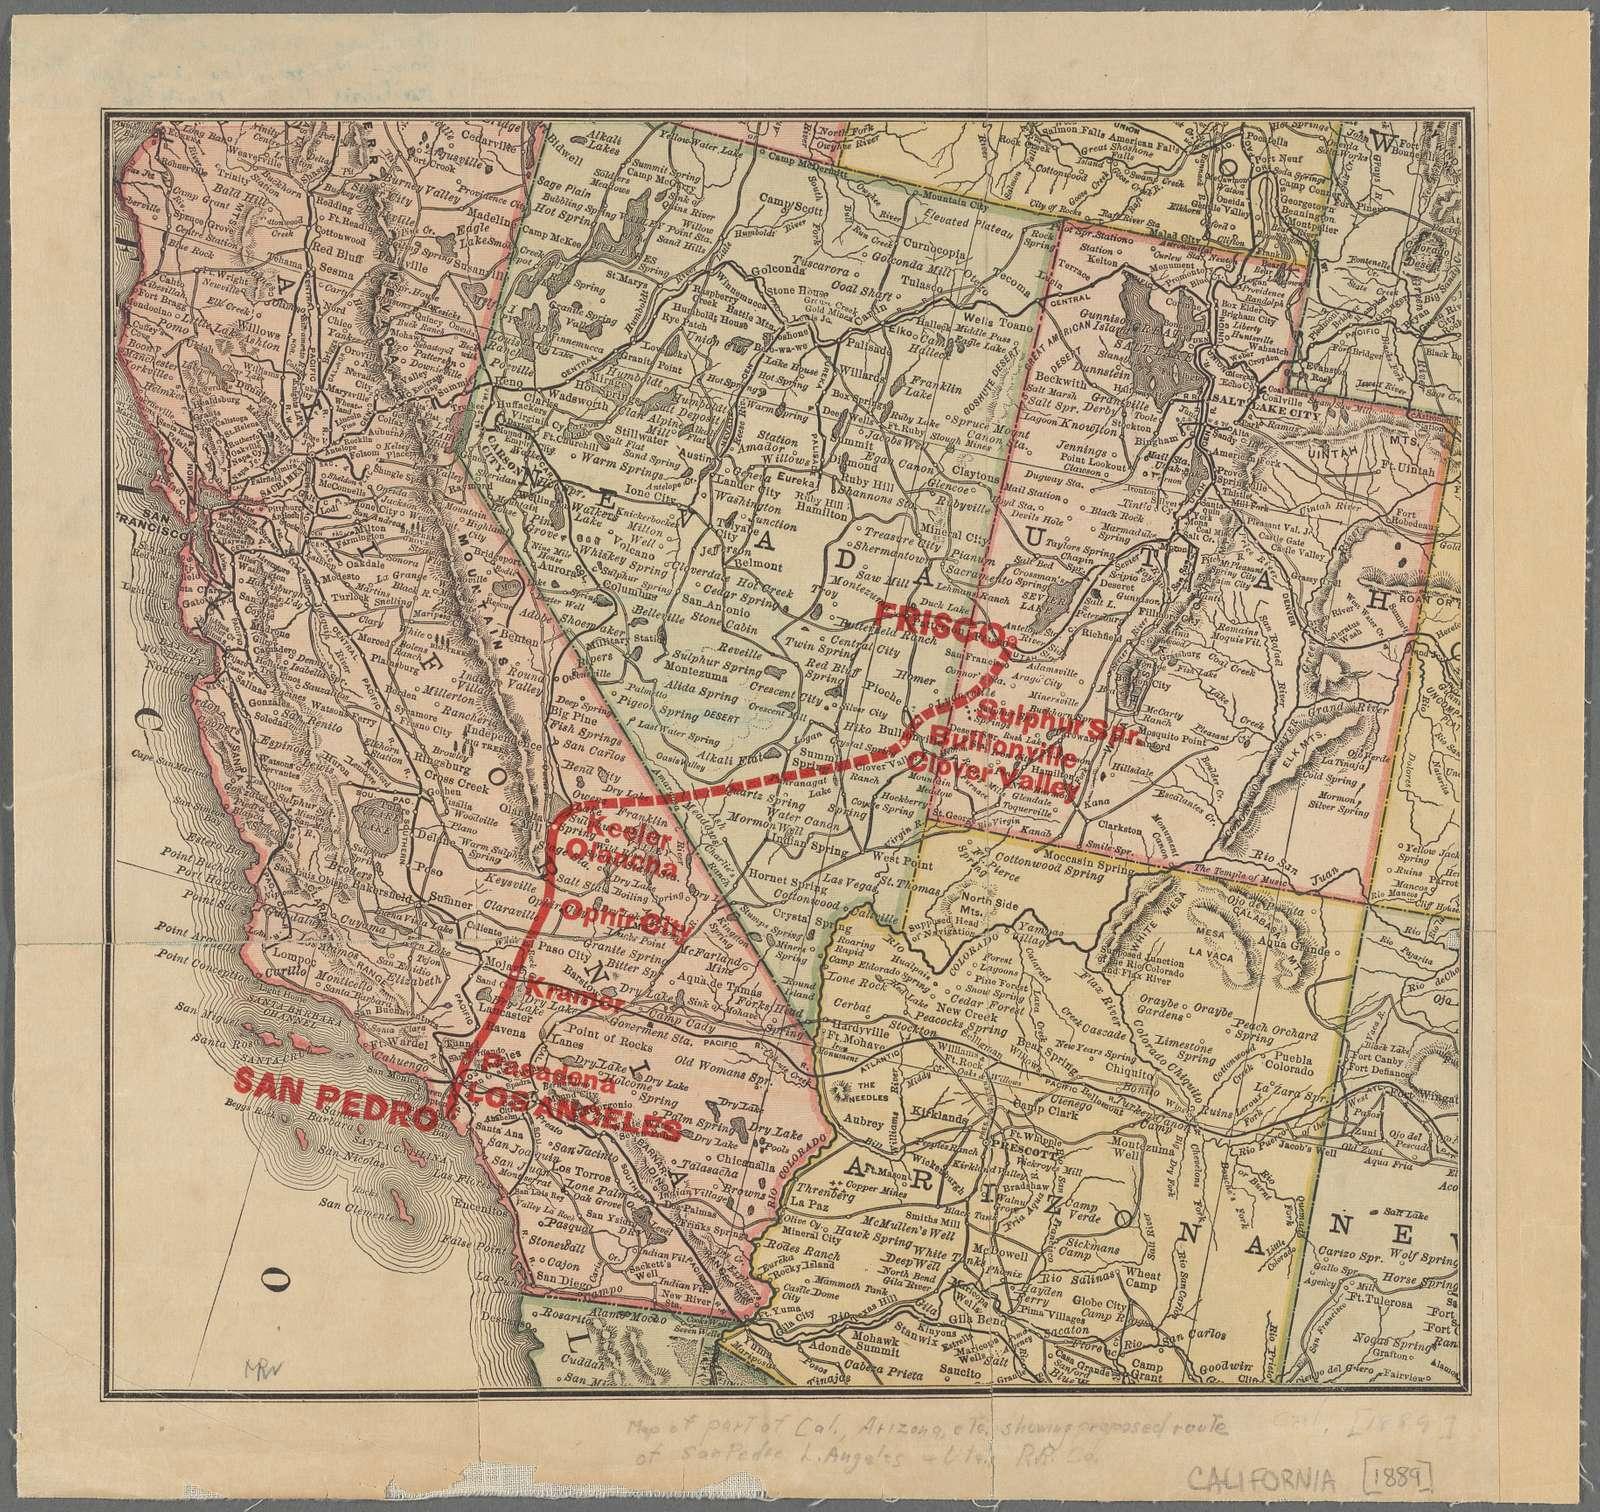 Map of part of California, Arizona, Nevada, & Utah : showing the San Pedro, Los Angeles and Utah Railway Company